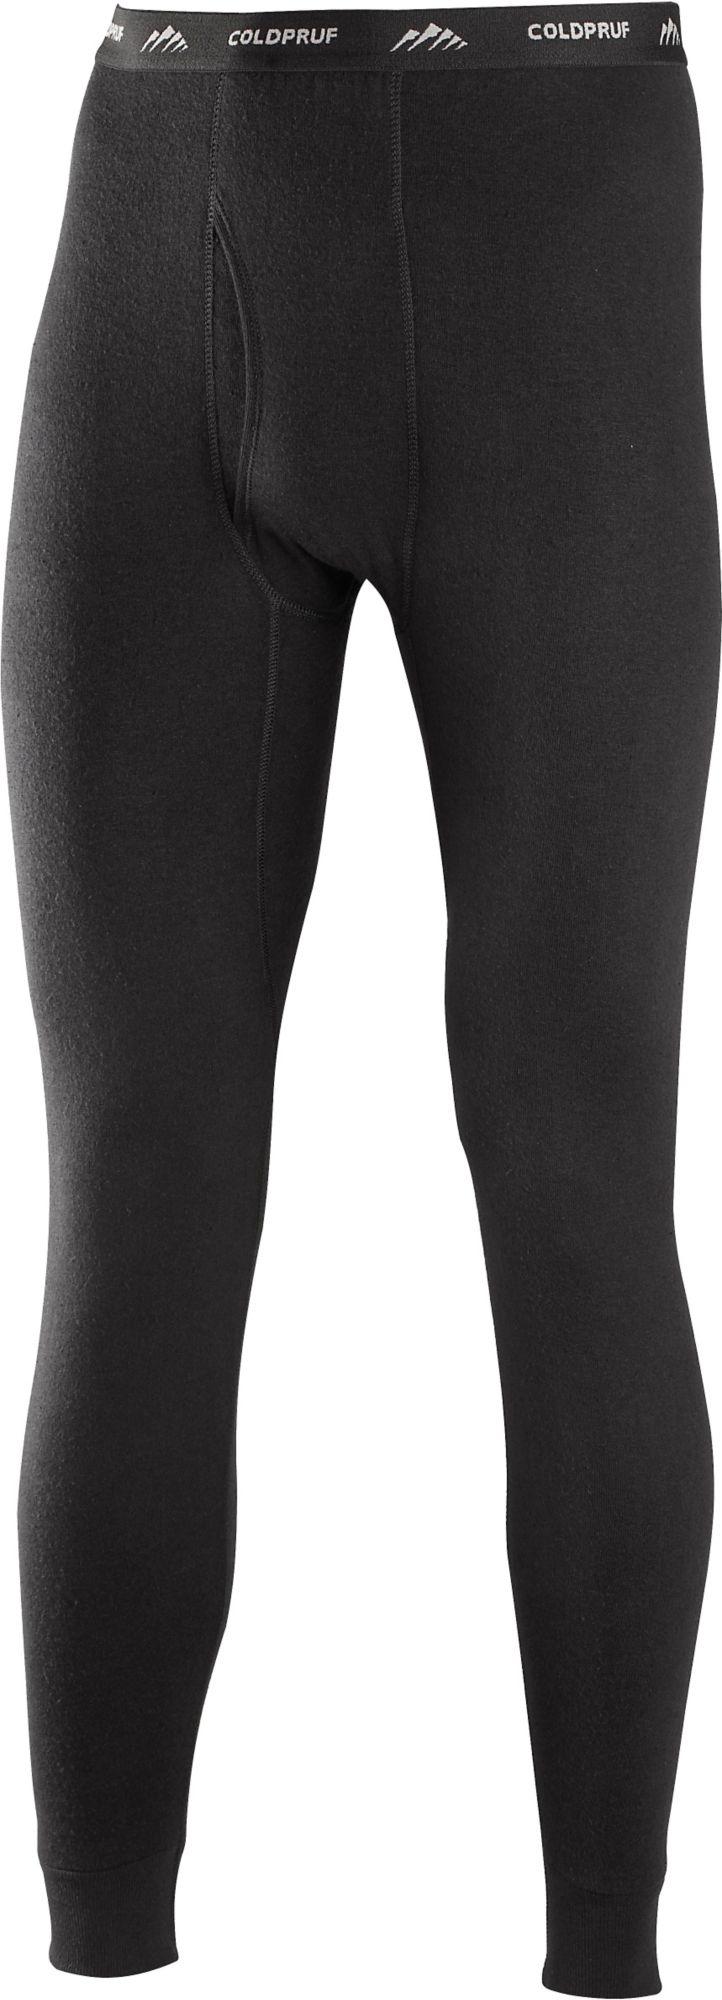 ColdPruf Men's Basic Base Layer Leggings, Size: Medium, Black thumbnail